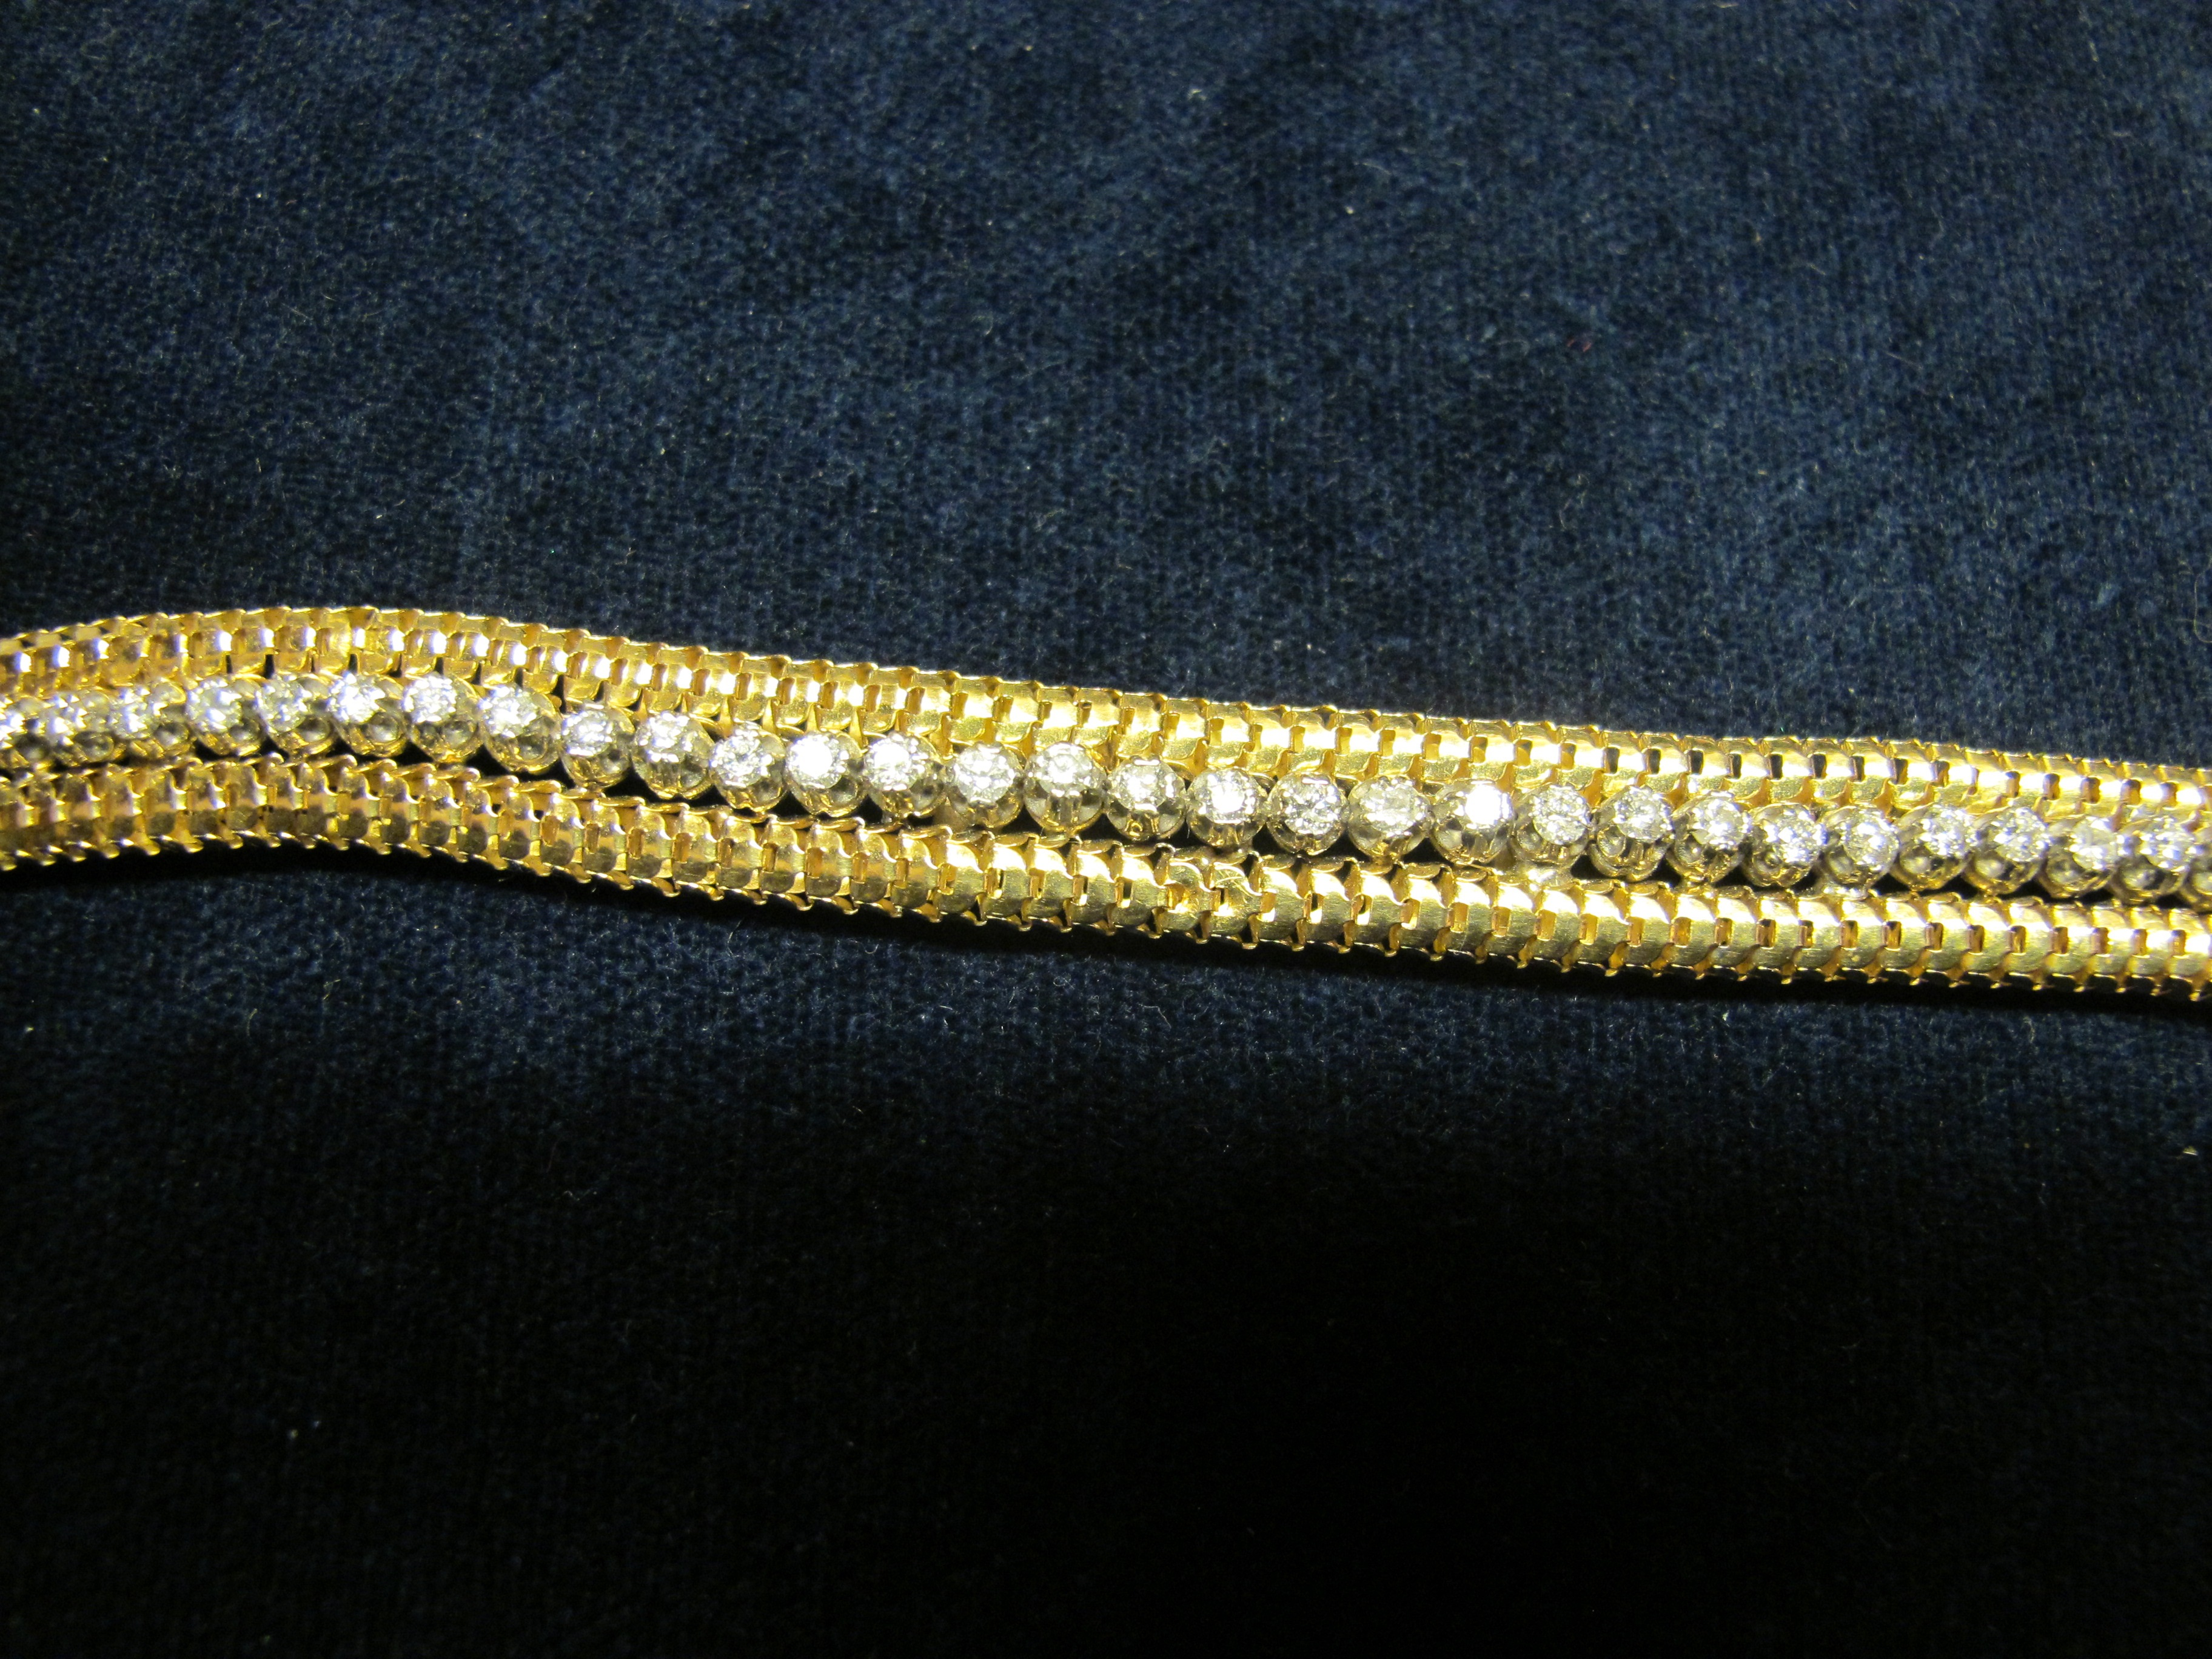 bracciale oro giallo e diamanti